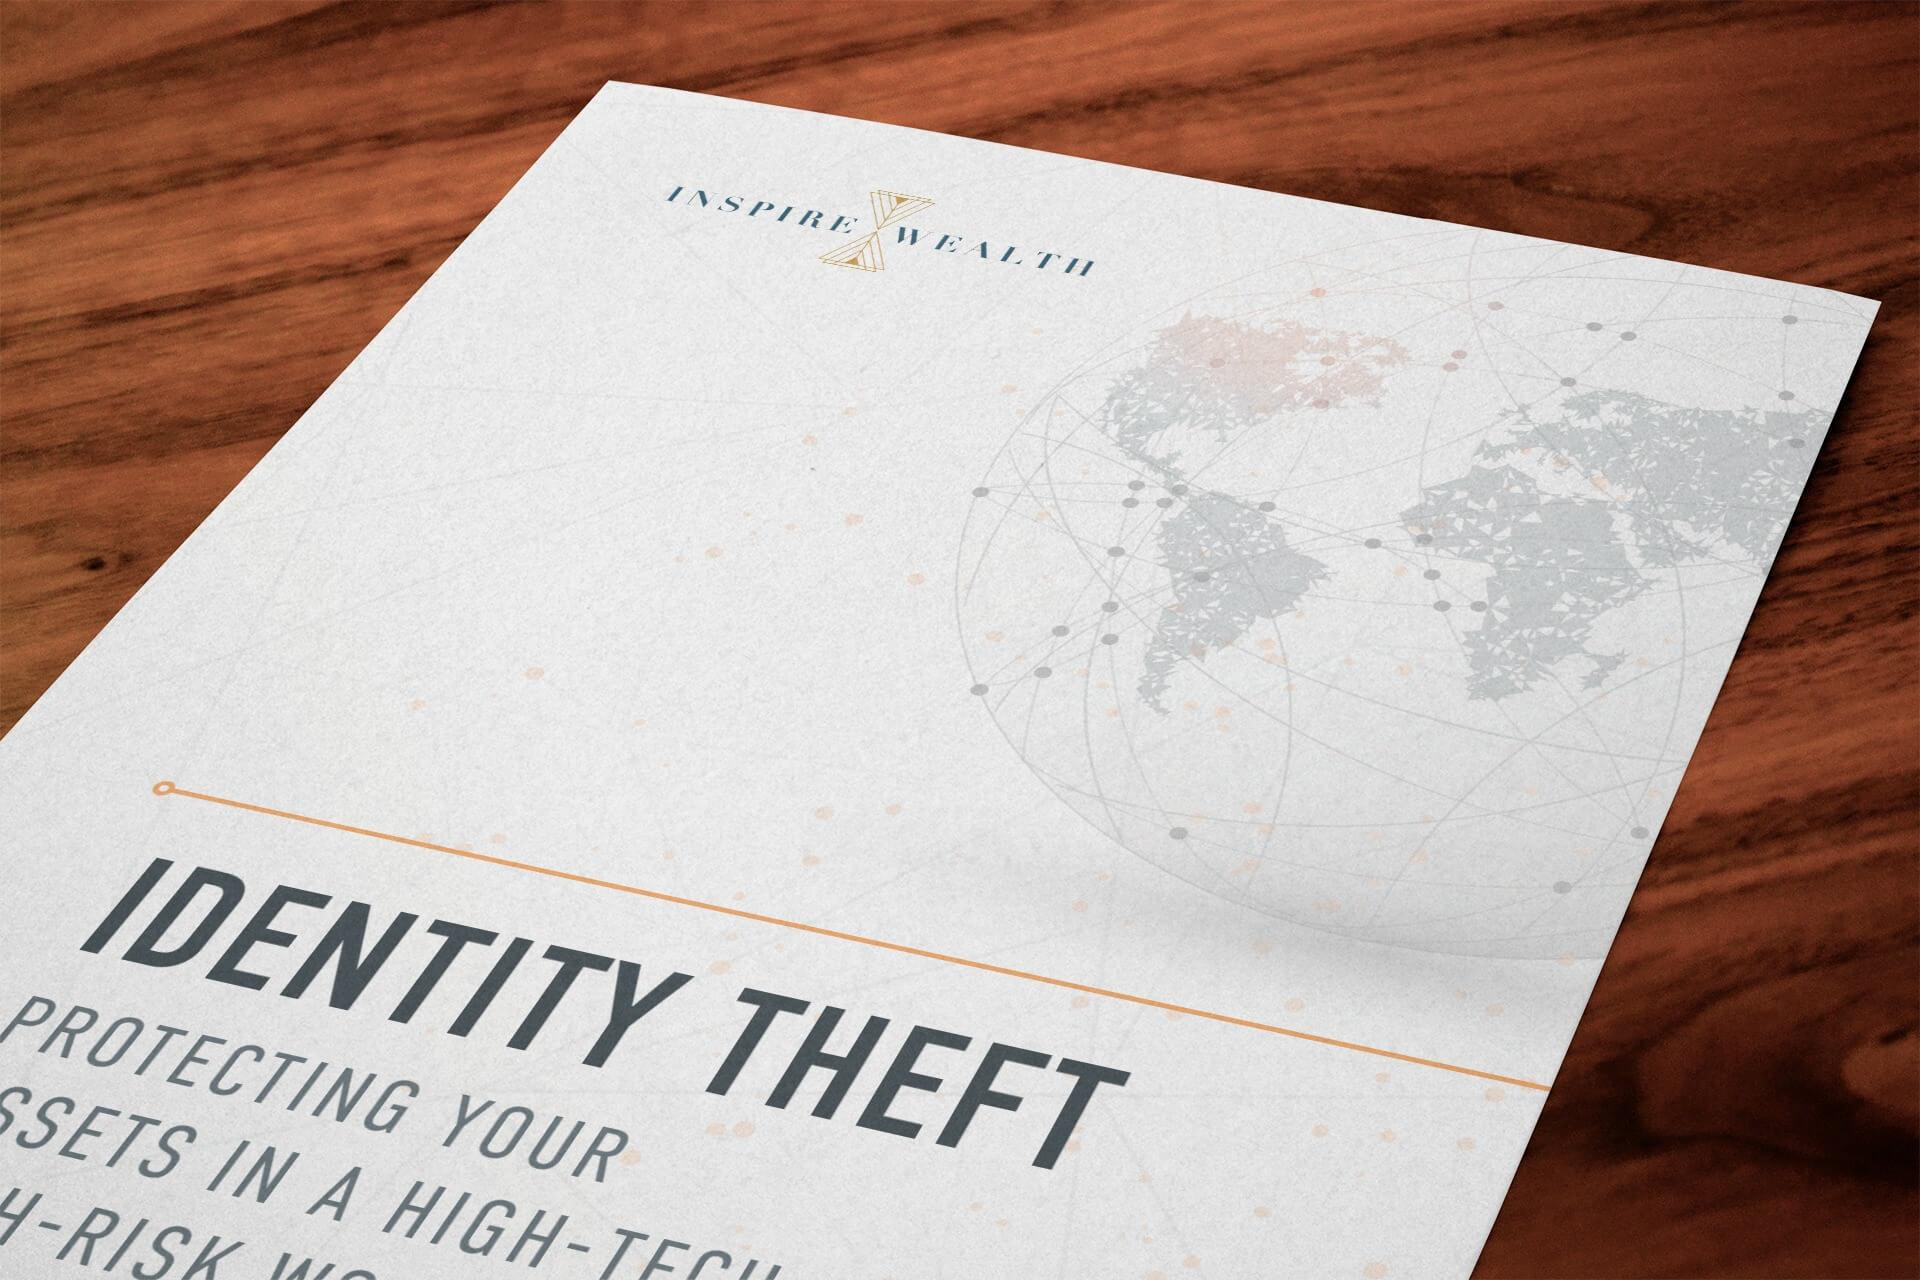 Identity Theft Thumbnail